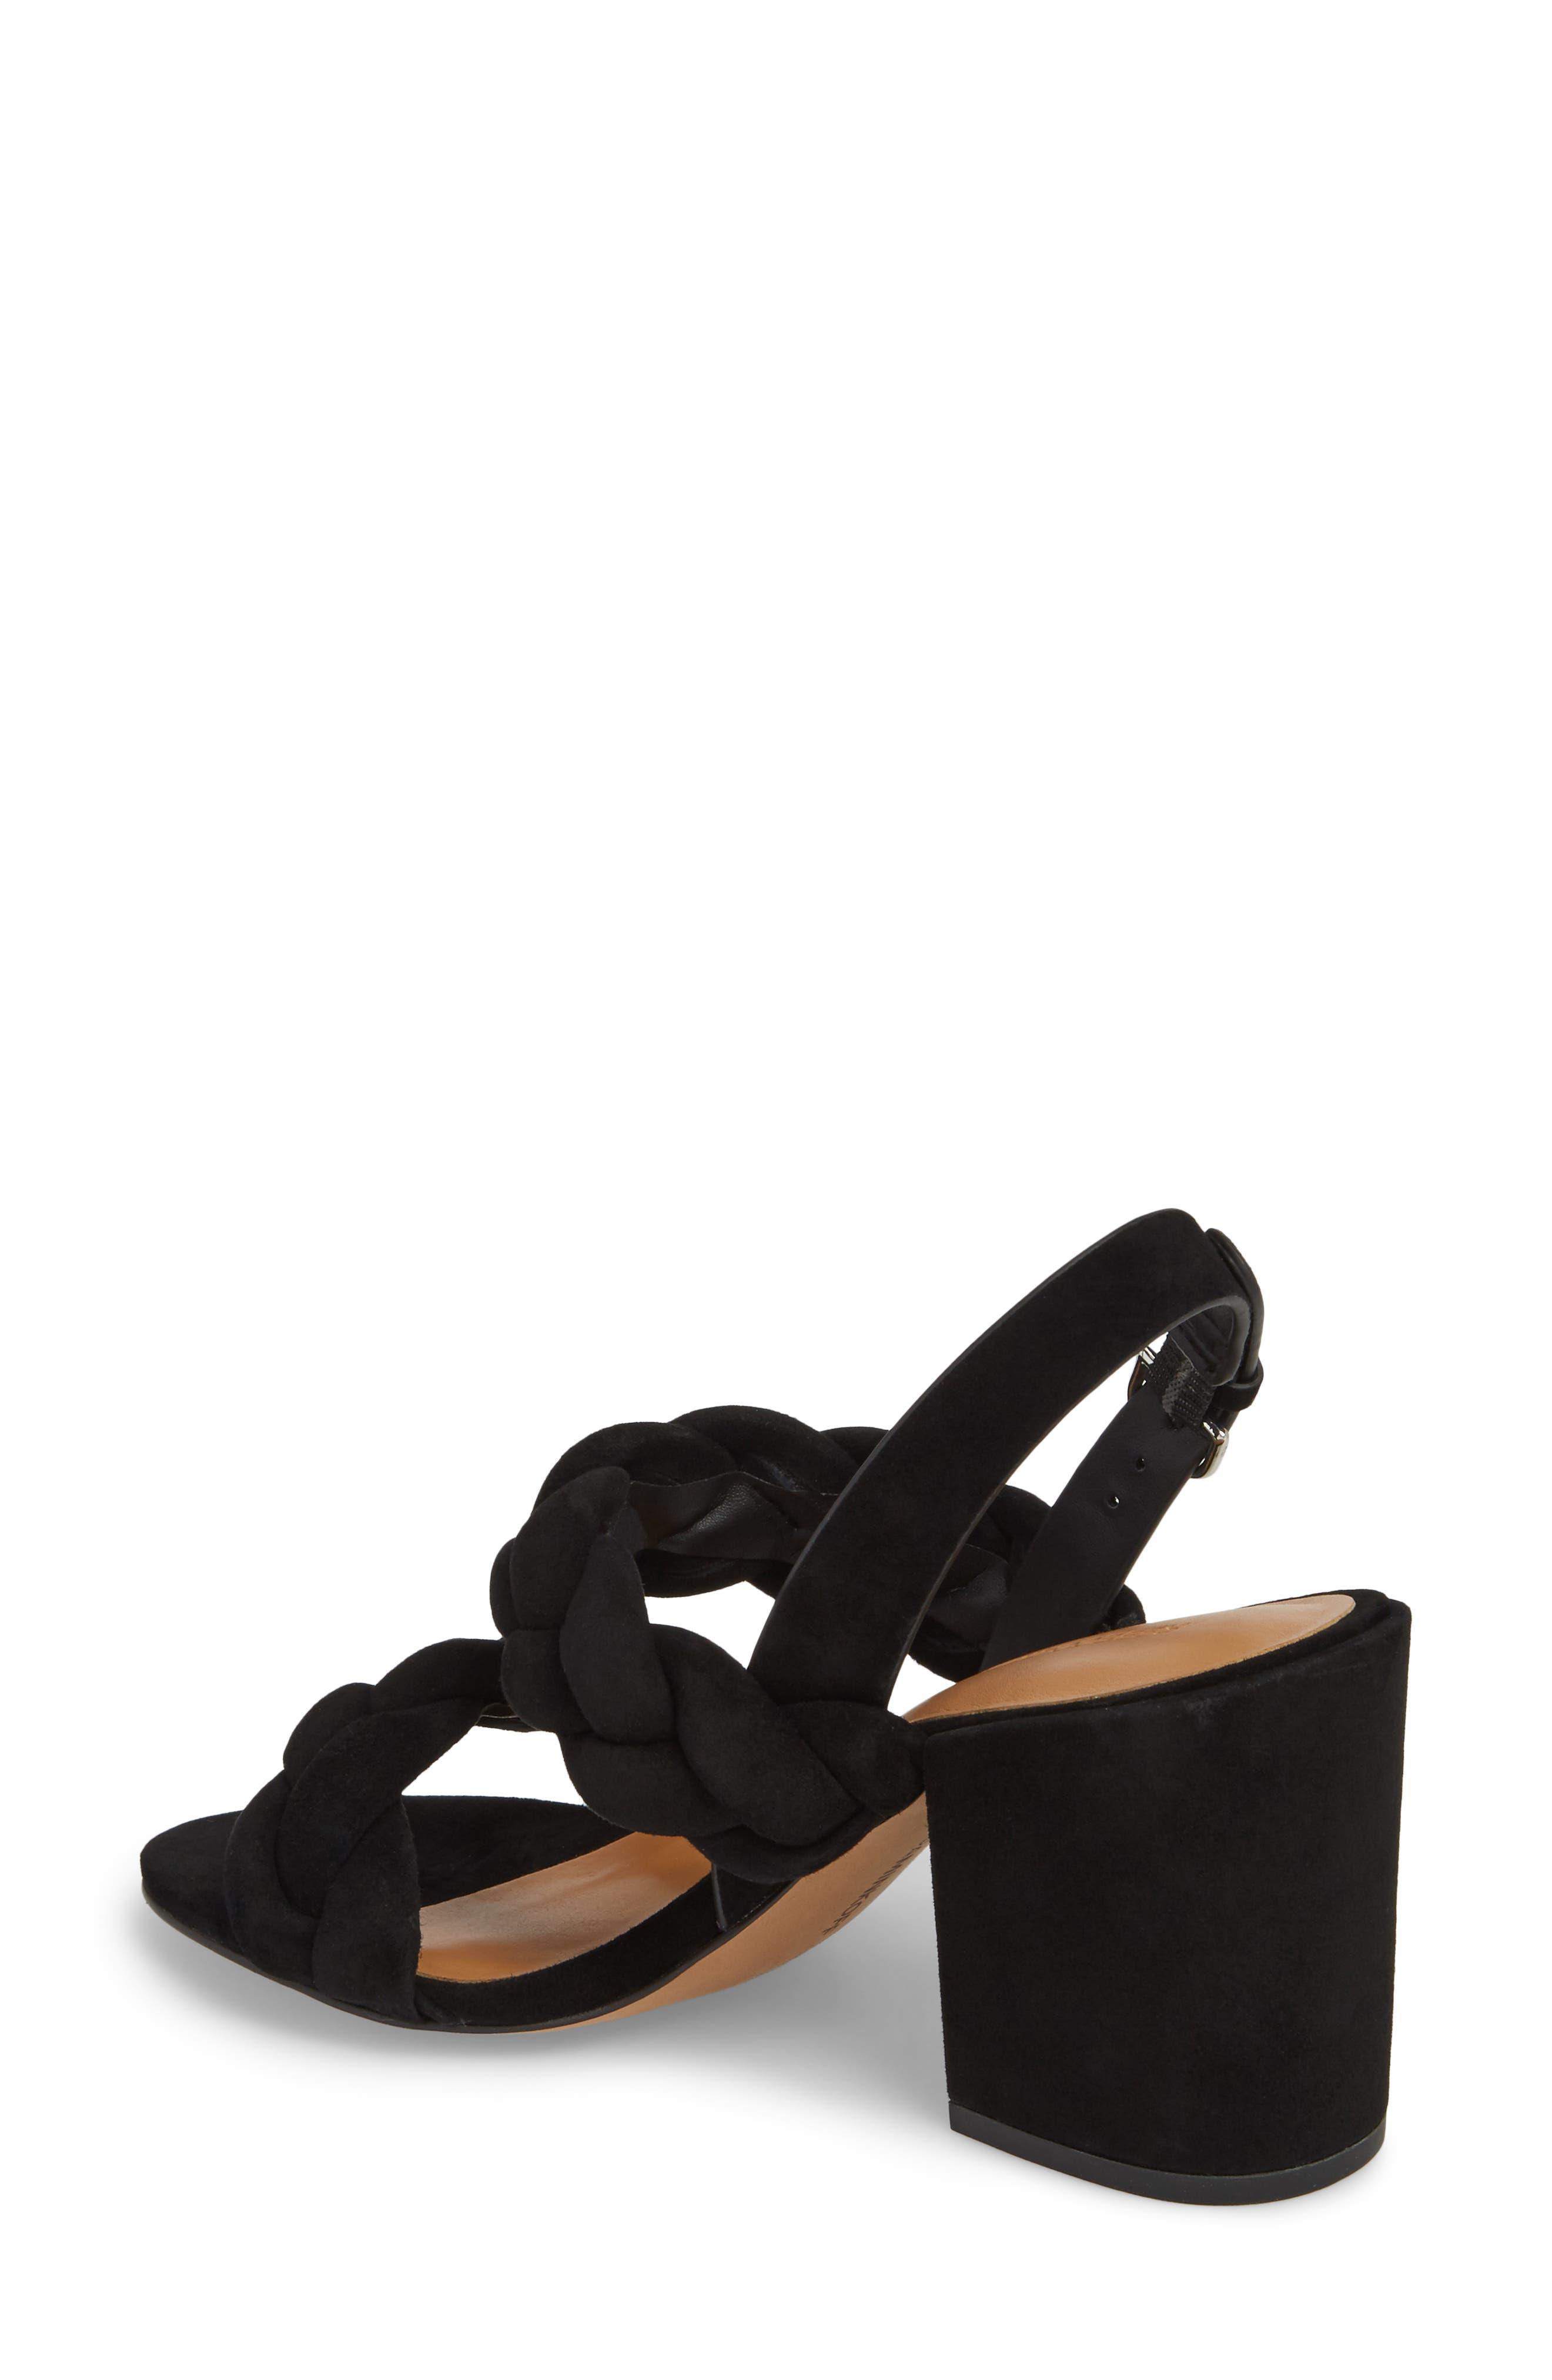 Candance Block Heel Sandal,                             Alternate thumbnail 2, color,                             BLACK LEATHER